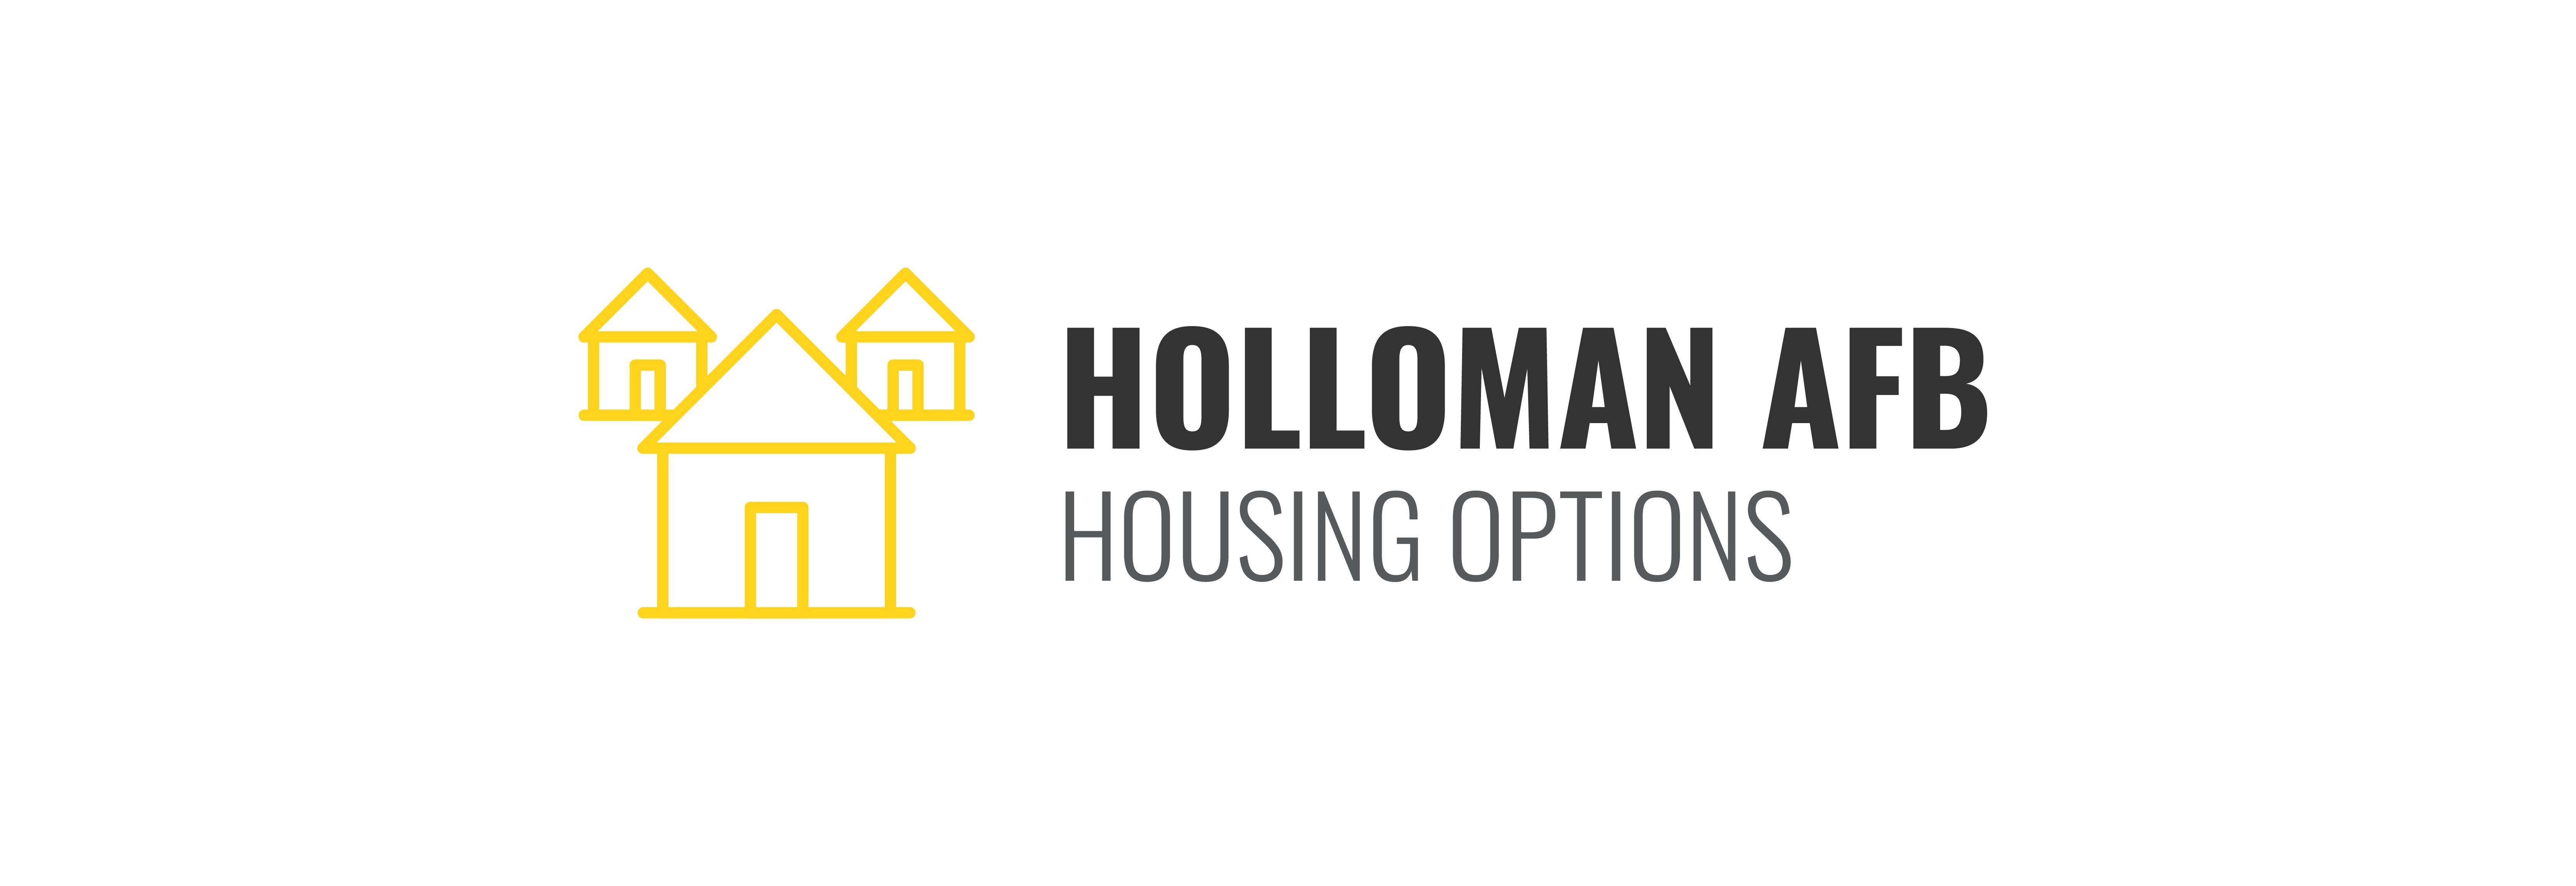 Holloman AFB Housing Options